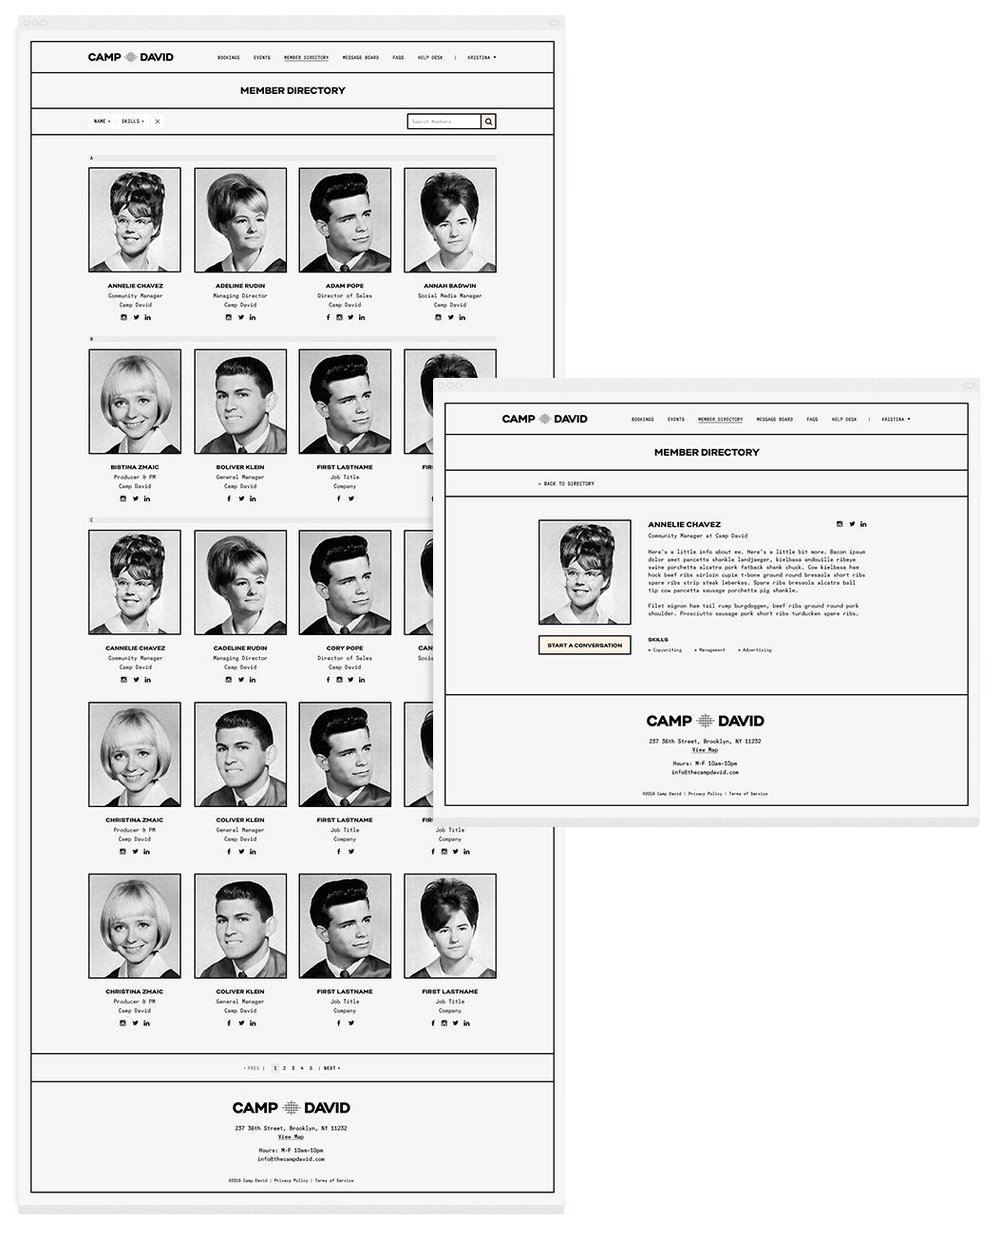 zmaic-milk-camp-david-ui-ux-web-design-nexudus-white-label-members.jpg